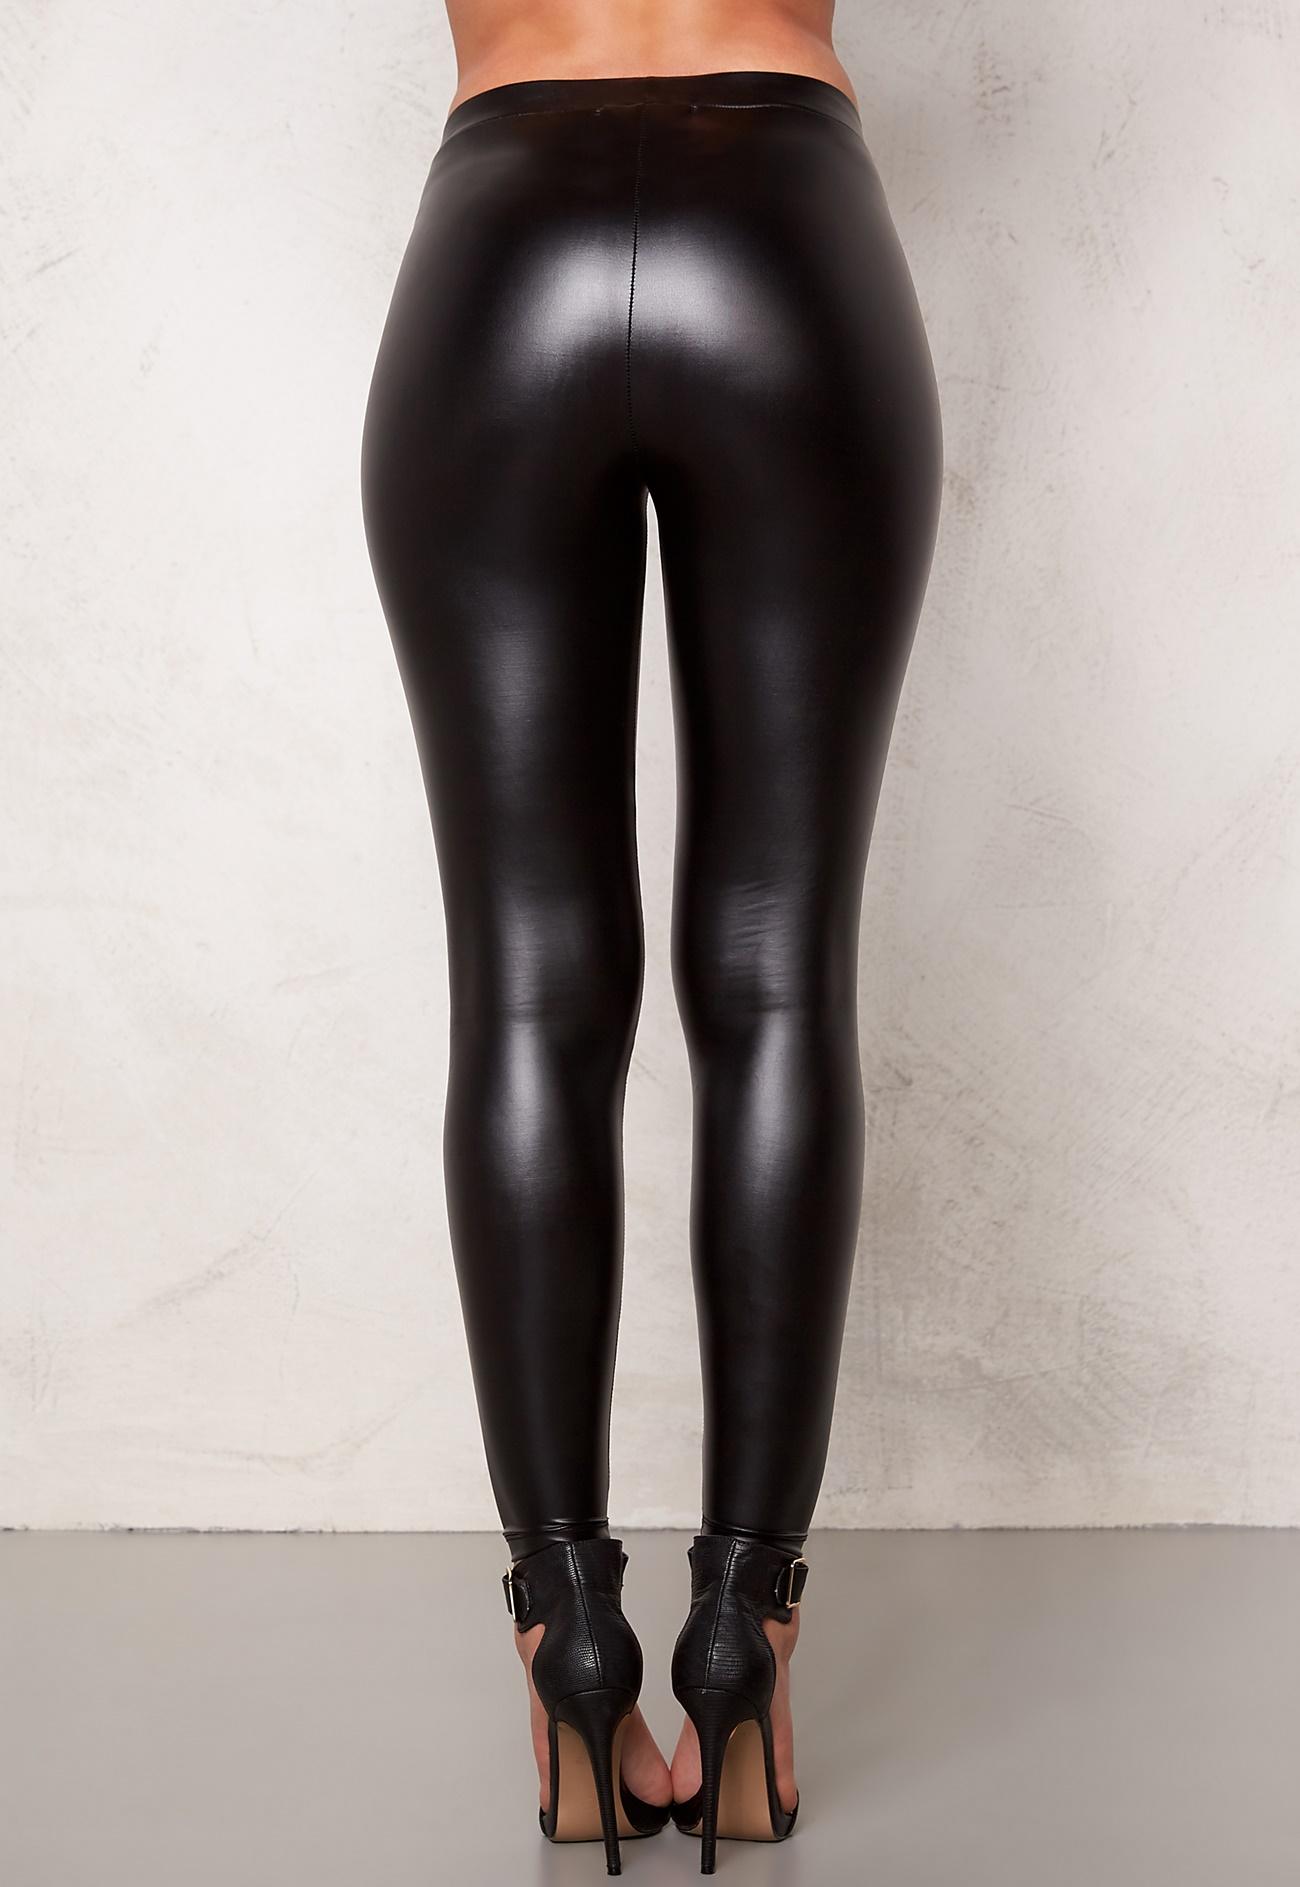 svenska porrfilmer tube sexiga tights